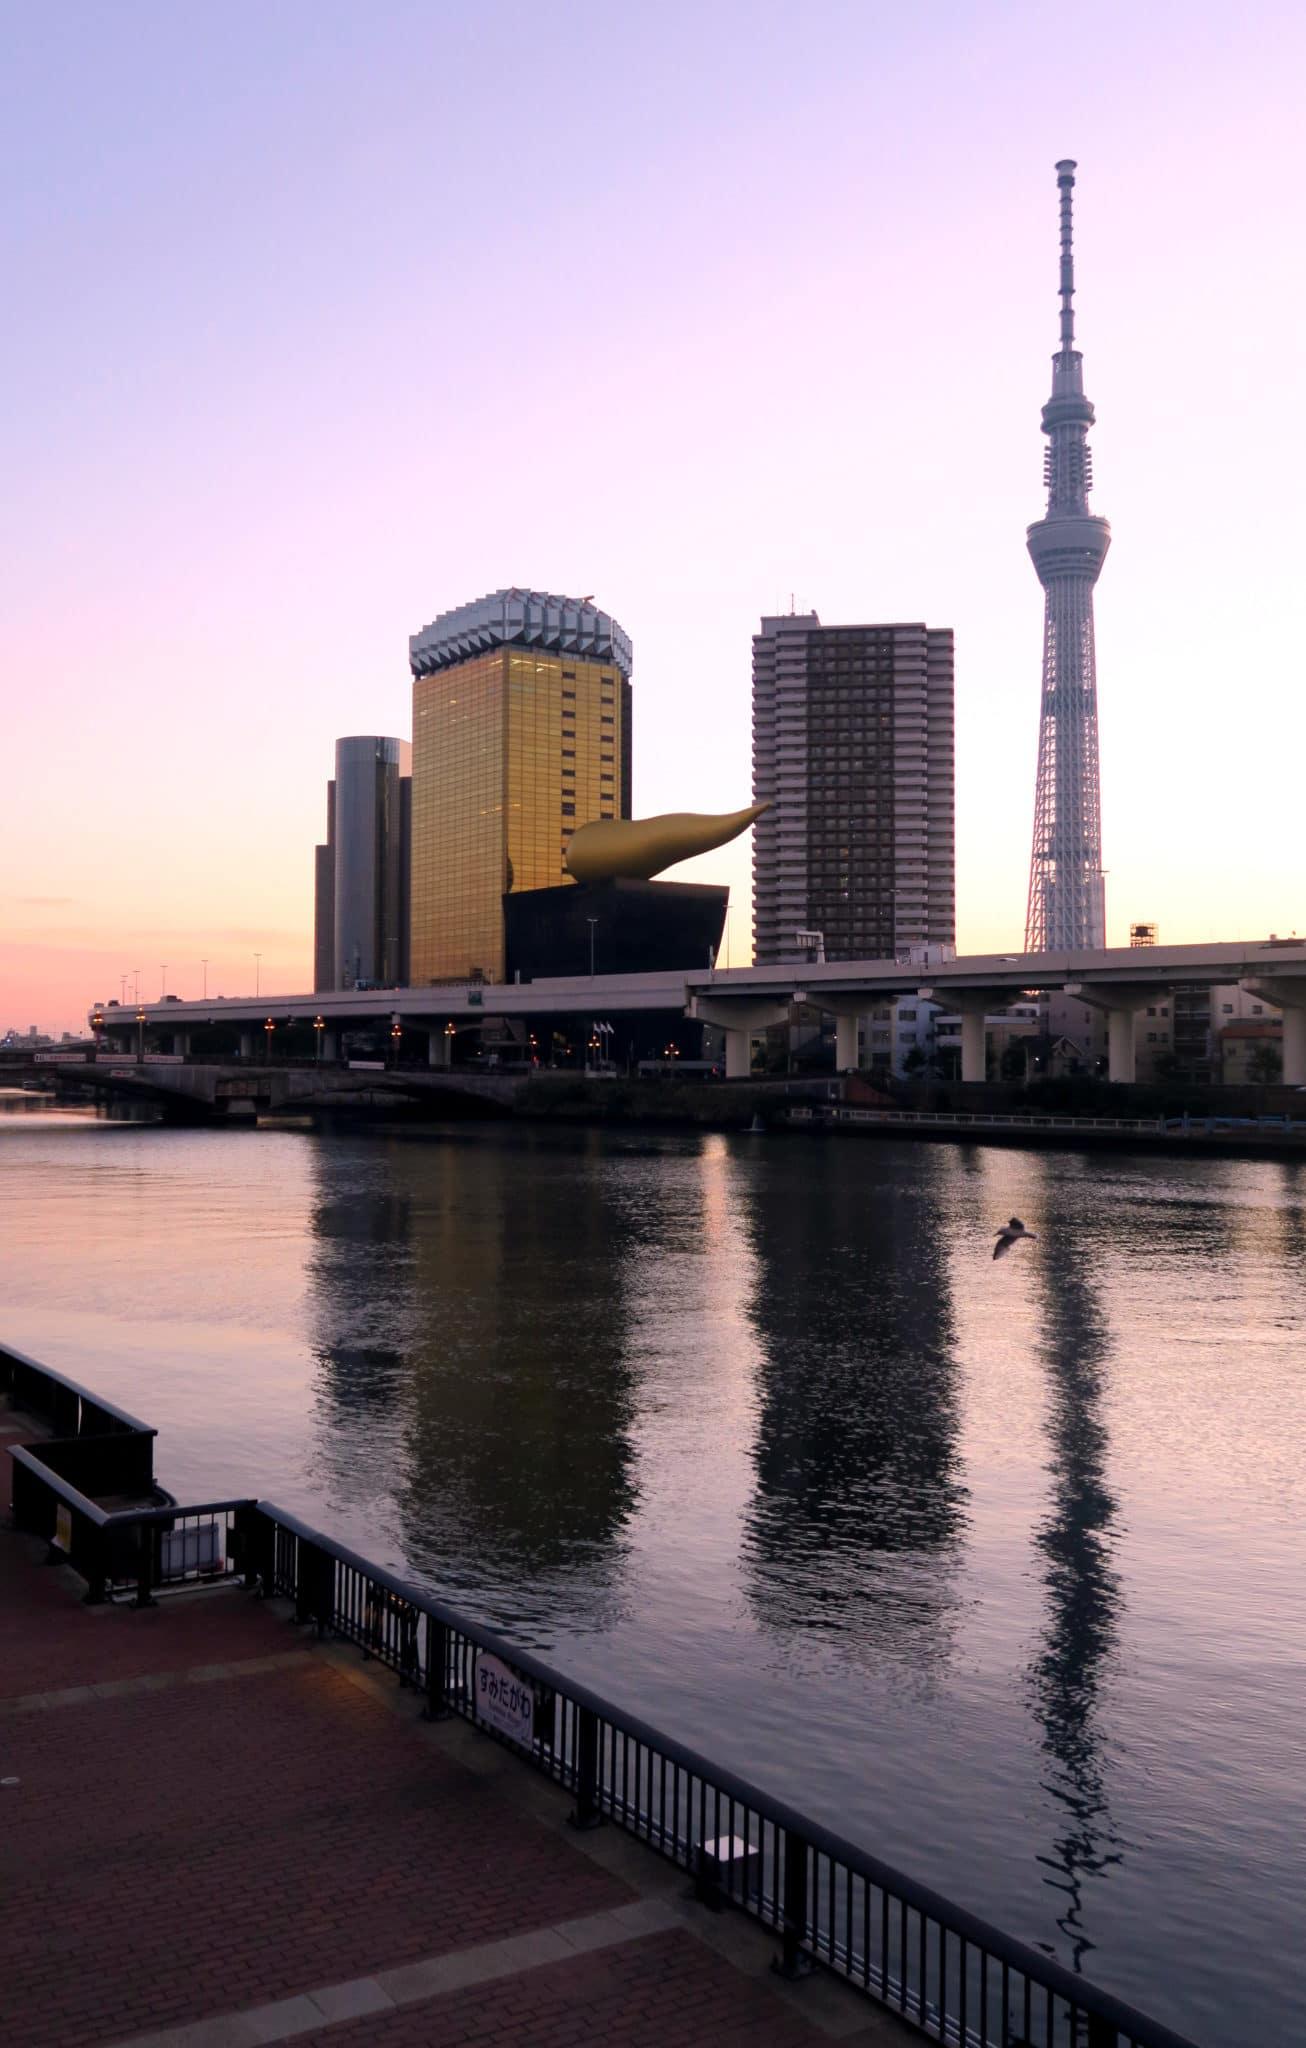 Tower Tower at dawn